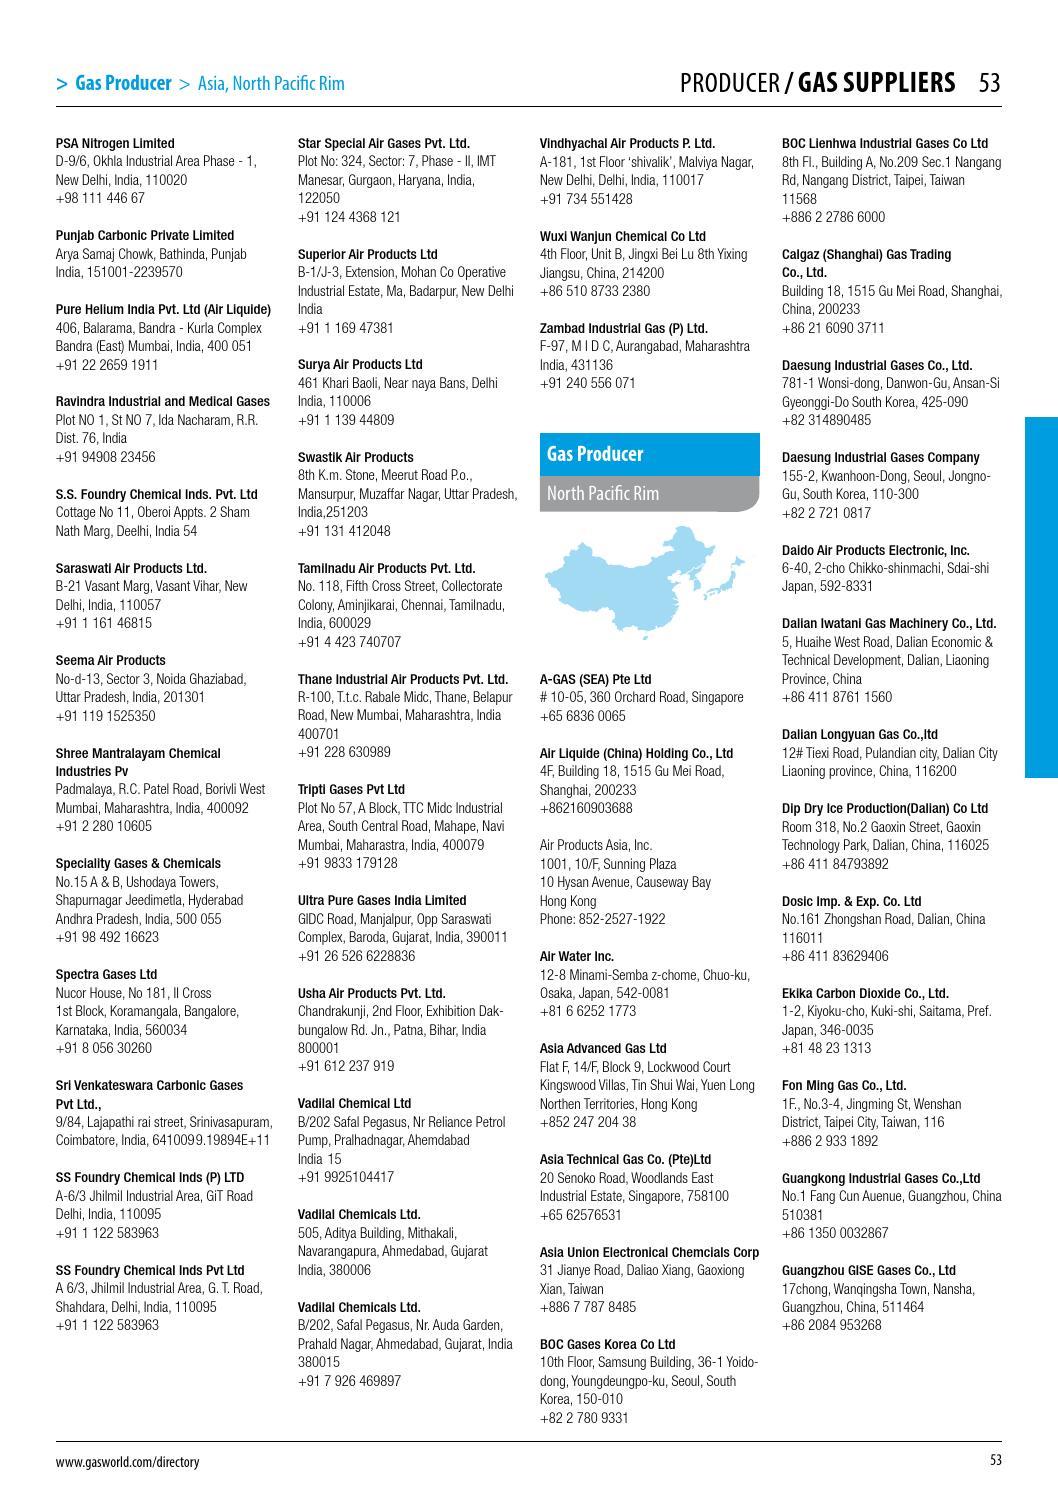 Okhla Industrial Area Directory Pdf